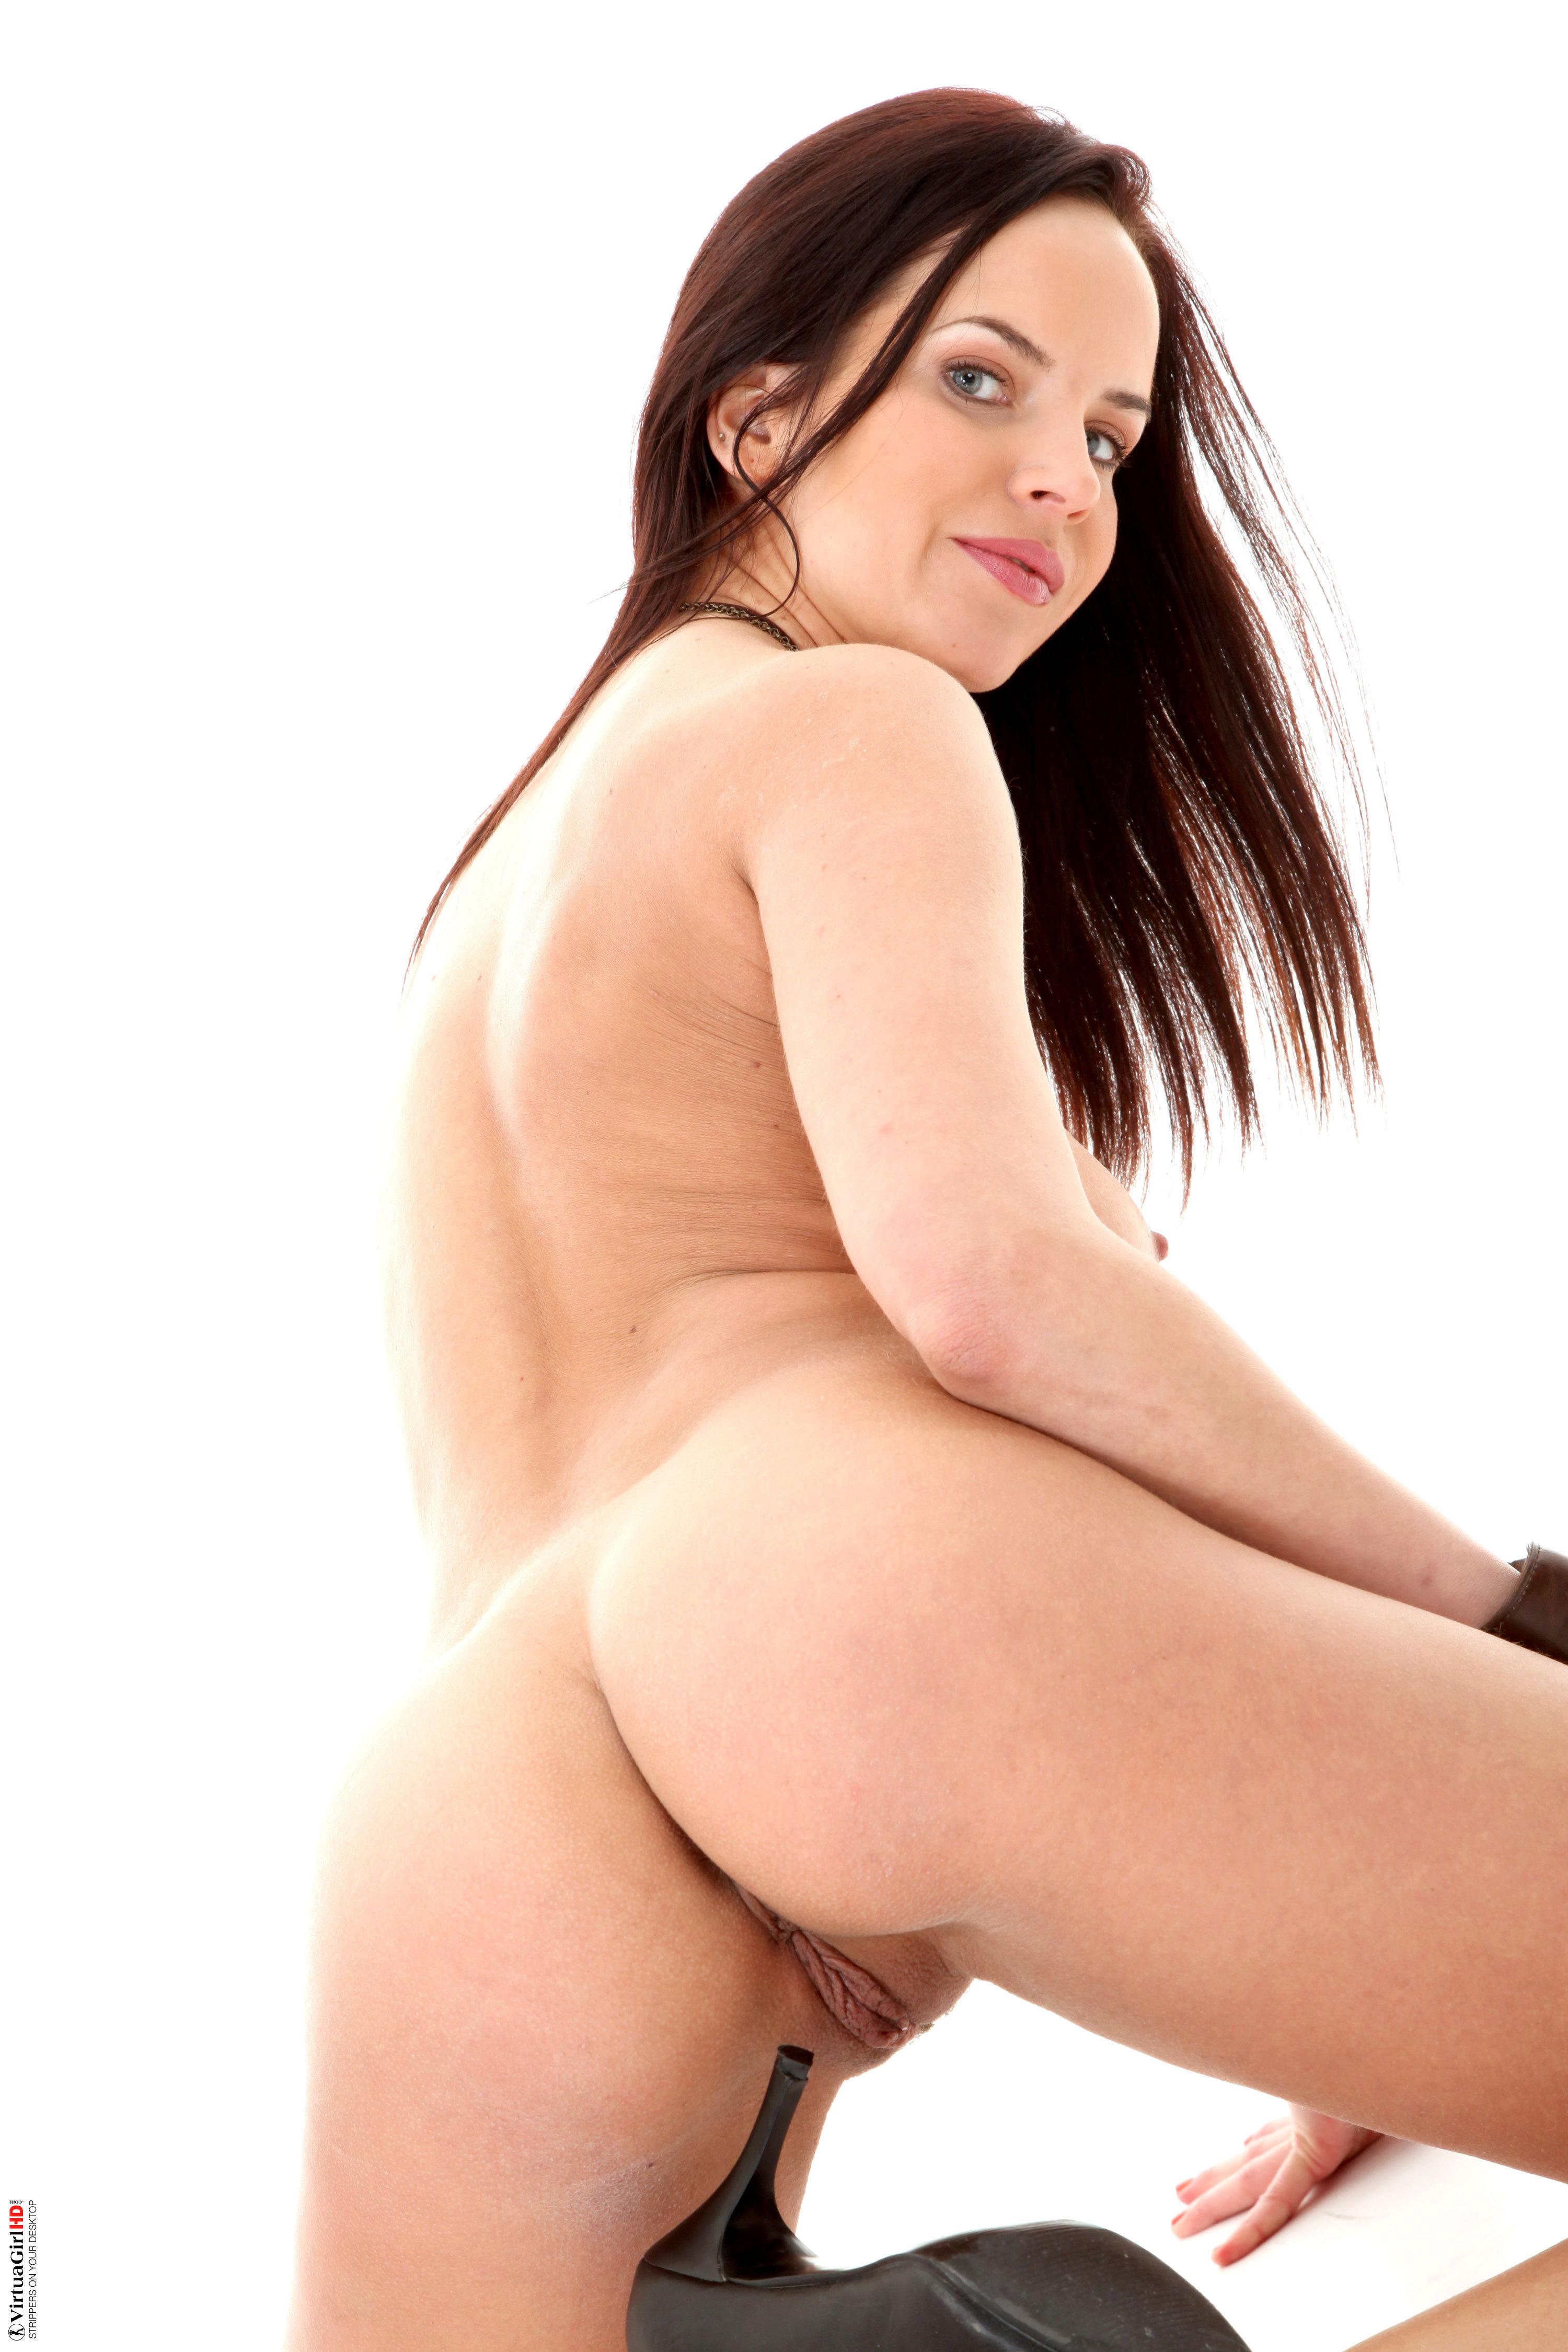 girls stripping sets tumblr